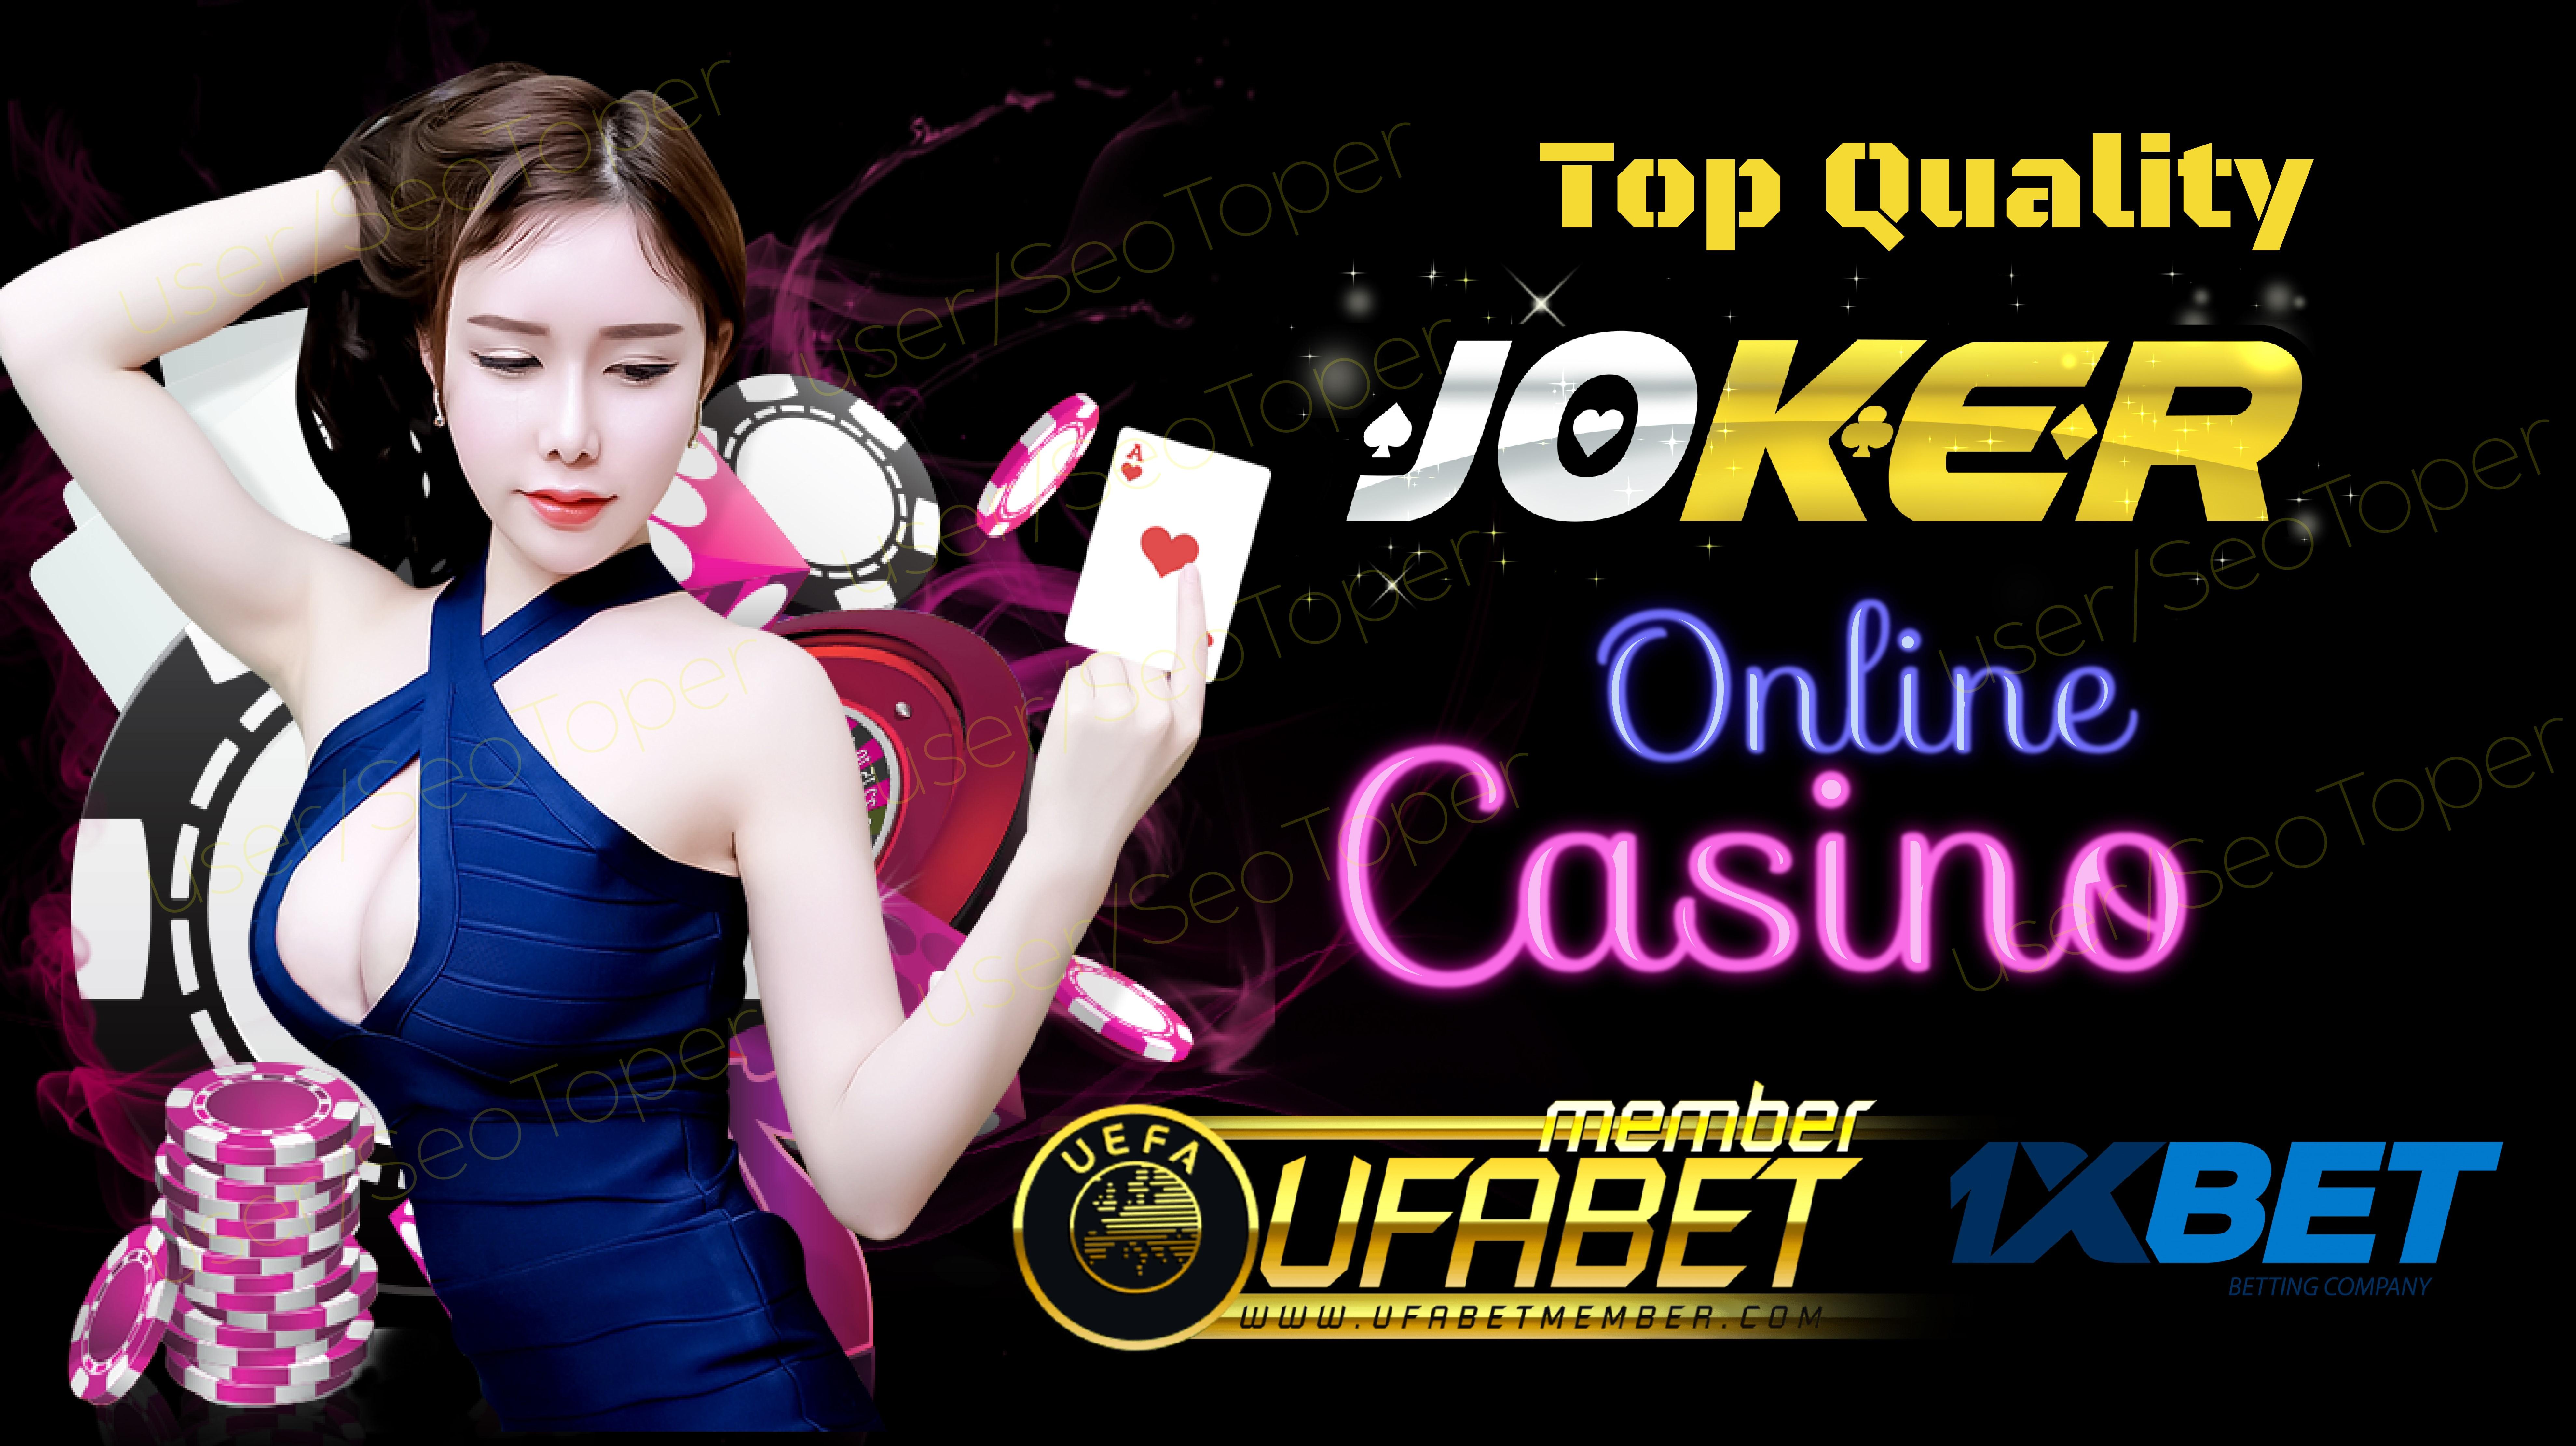 120+ permanent DA 58+ PBN Backlinks UFABET,  Casino,  Gambling,  Poker,  Judi Related Websites